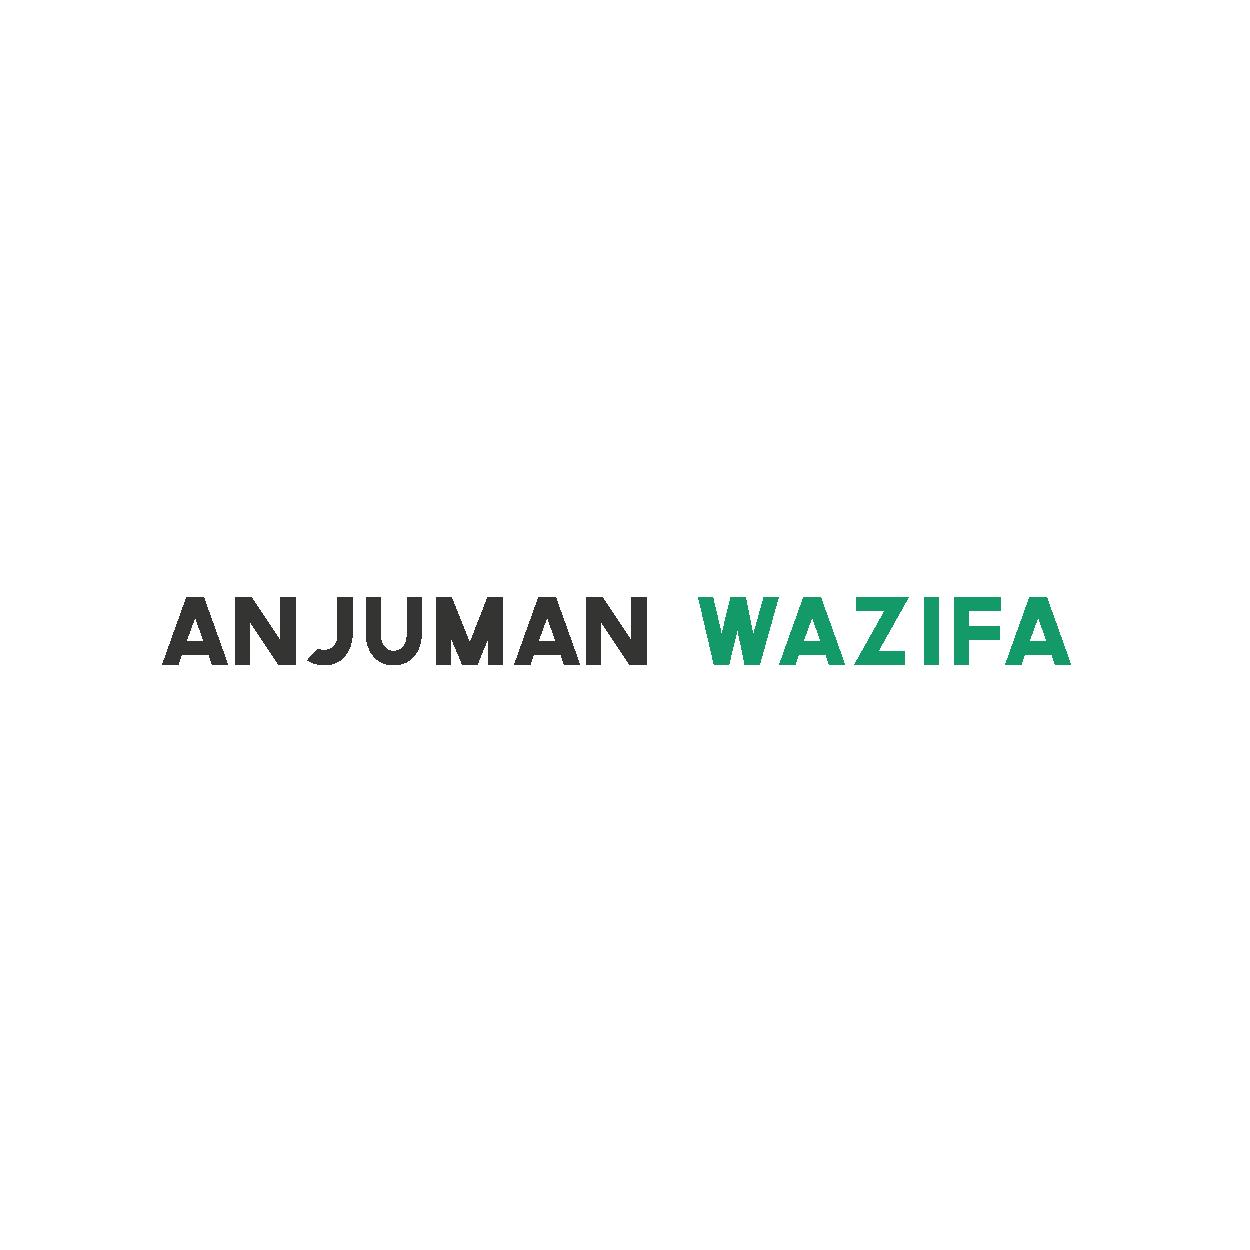 Anjuman Wazifa